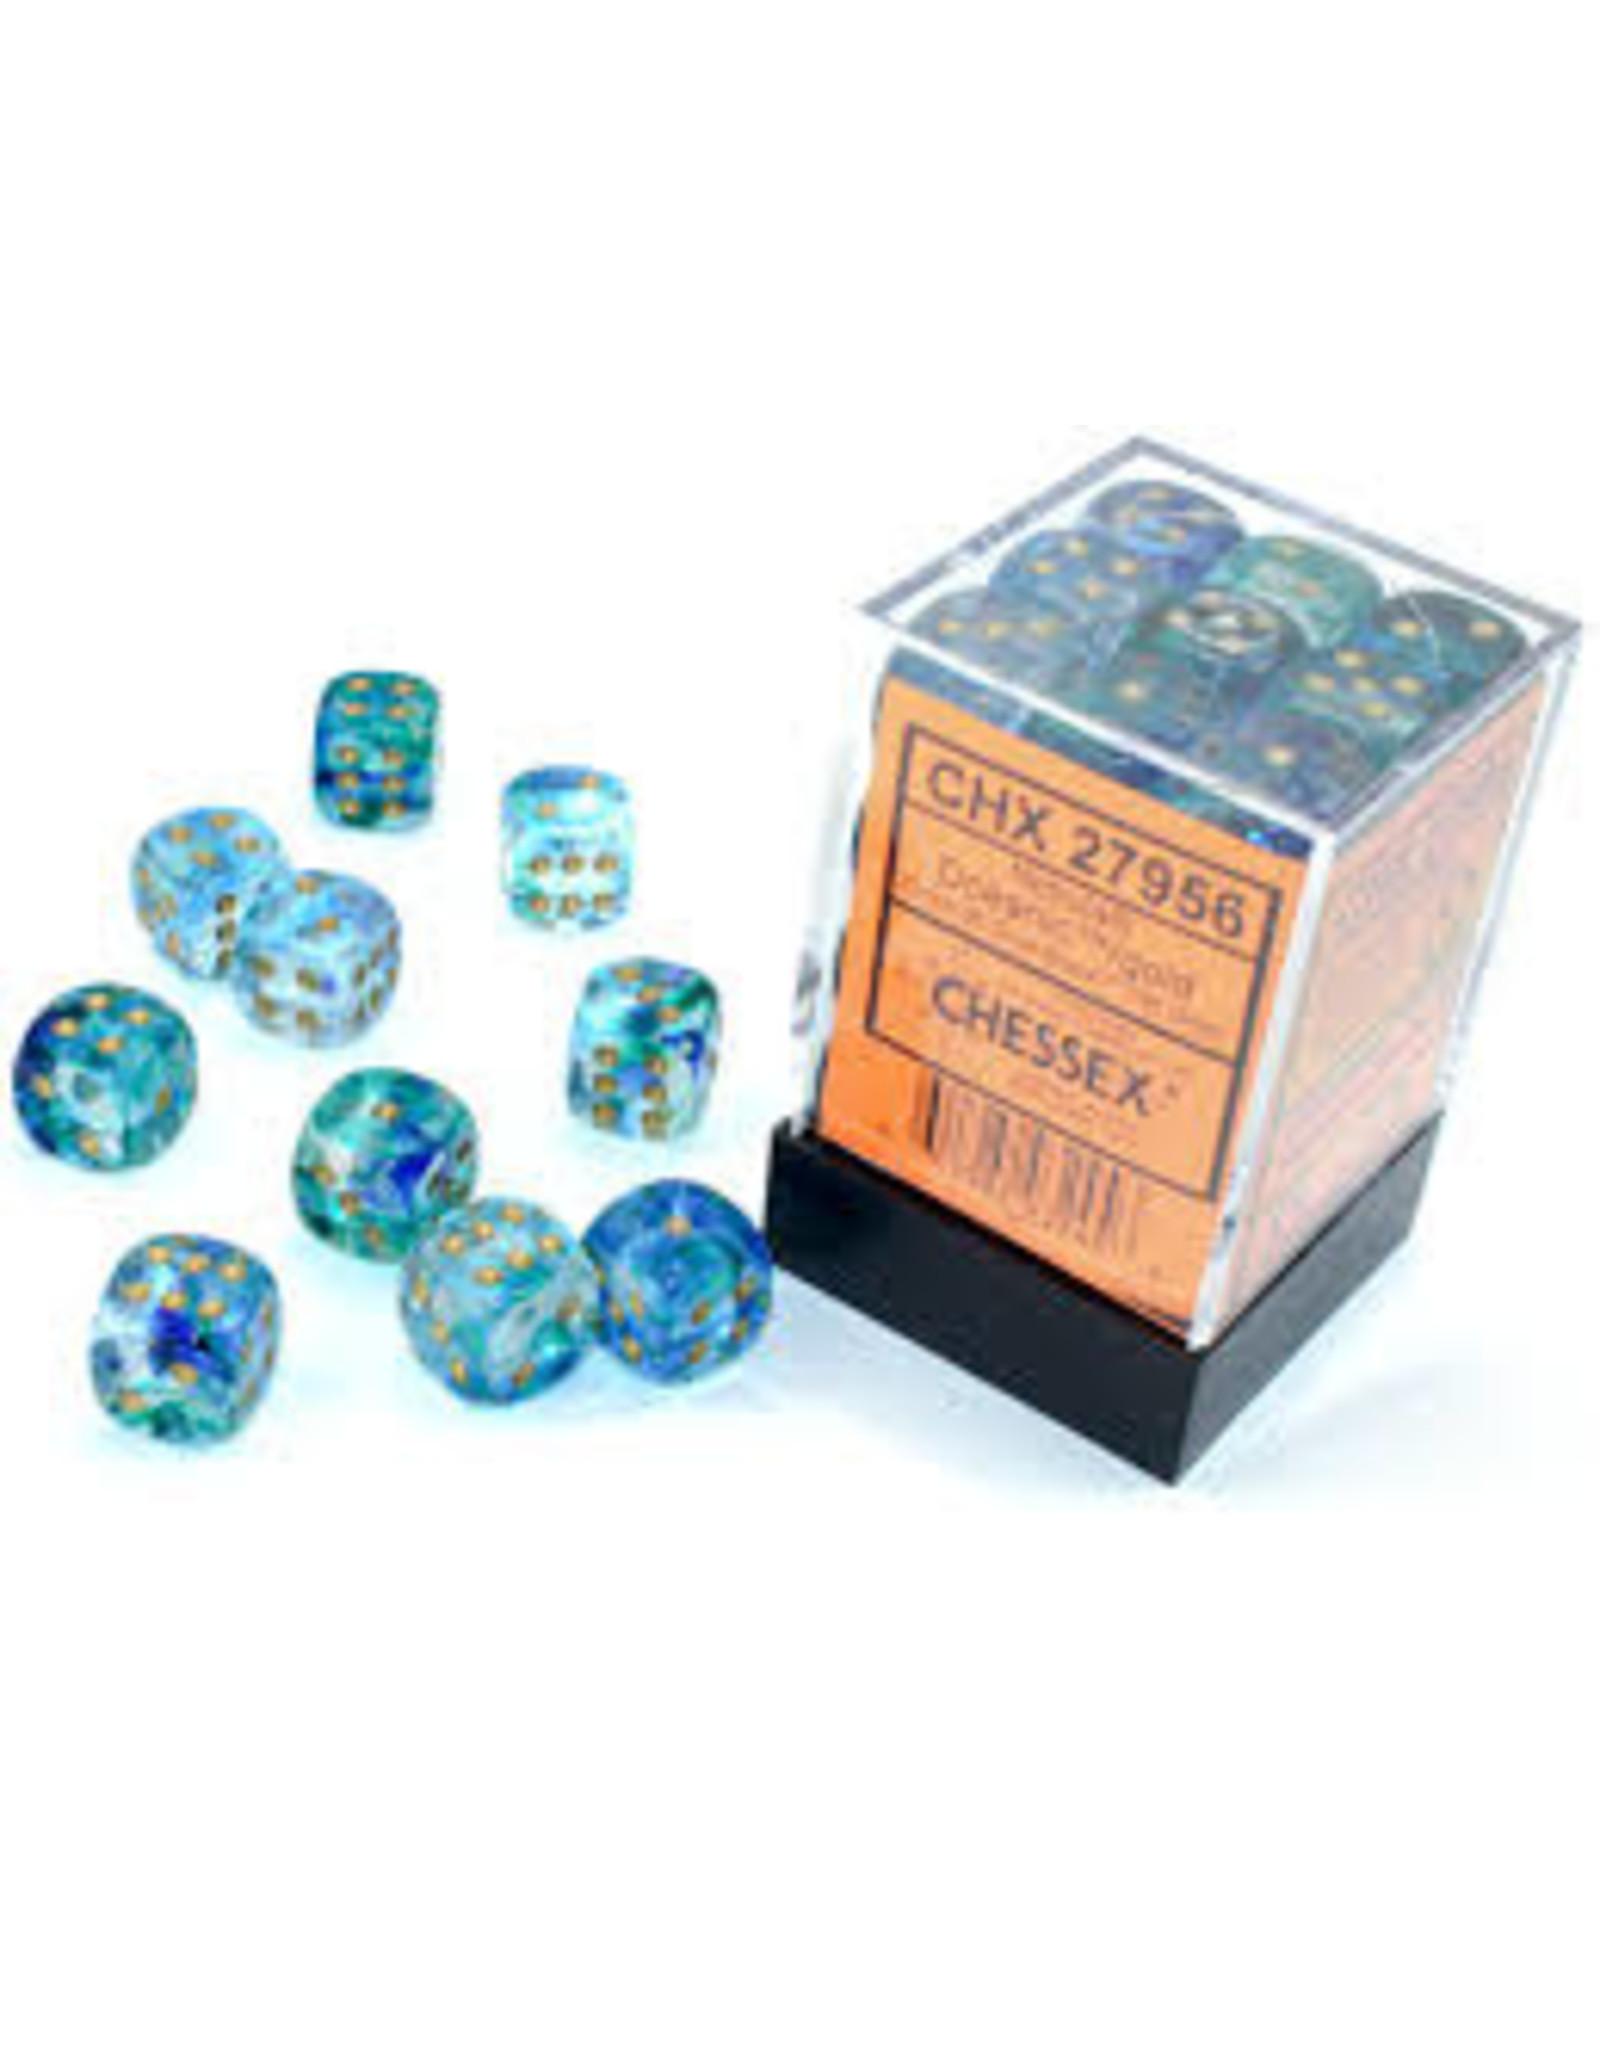 Chessex d6Cube 12mm Luminary NB Oceanic gd (36)